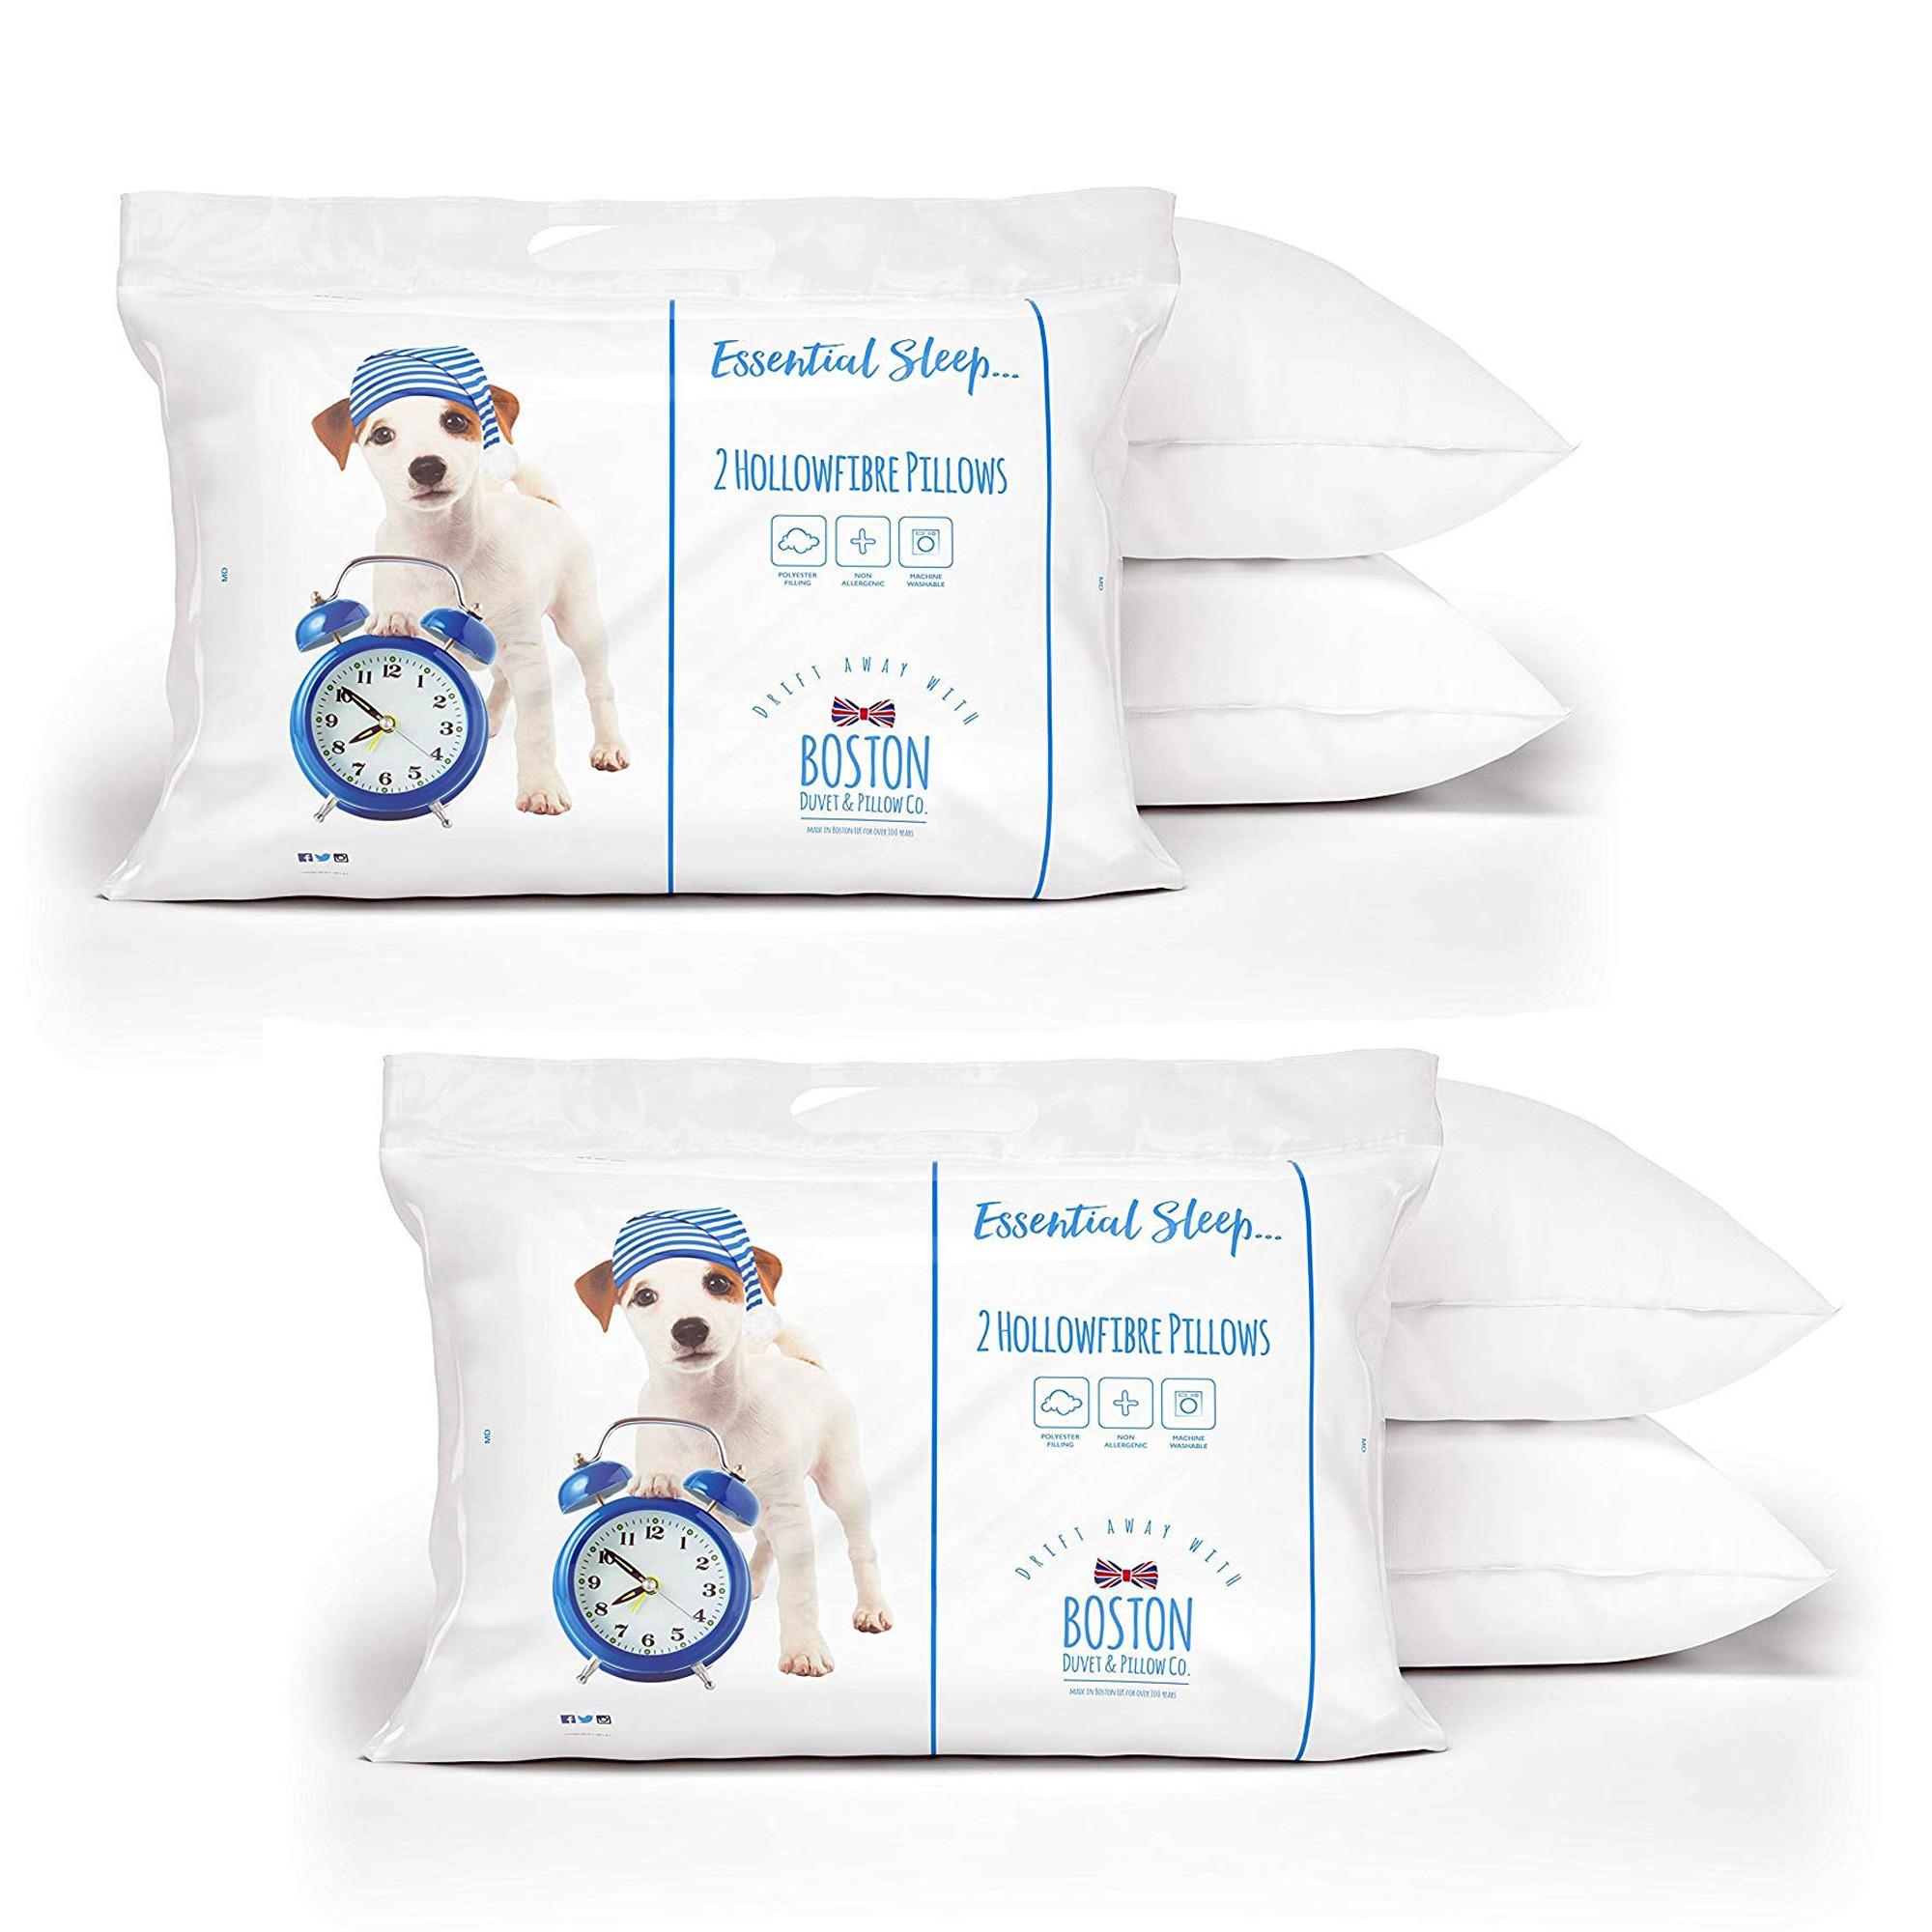 Boston Essential Sleep Microfibre Pillow Pair - Buy 1 Get 1 Free - £7.99 delivered for 4 Pillows @ Sleepseeker